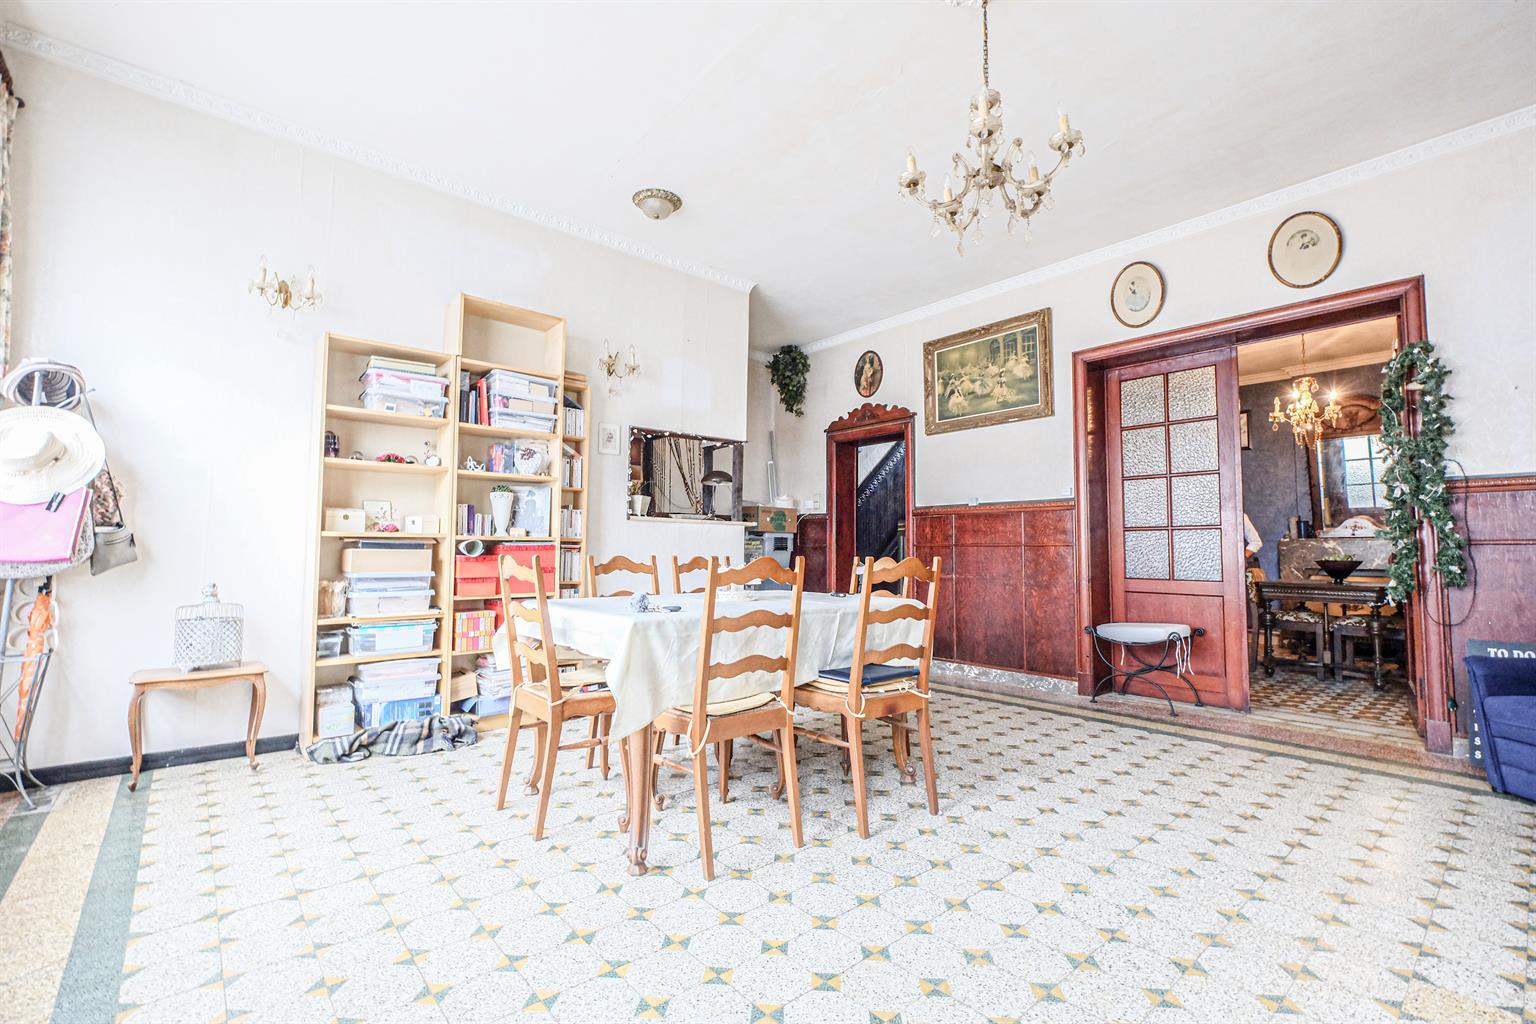 Maison - Tubize - #4437950-1